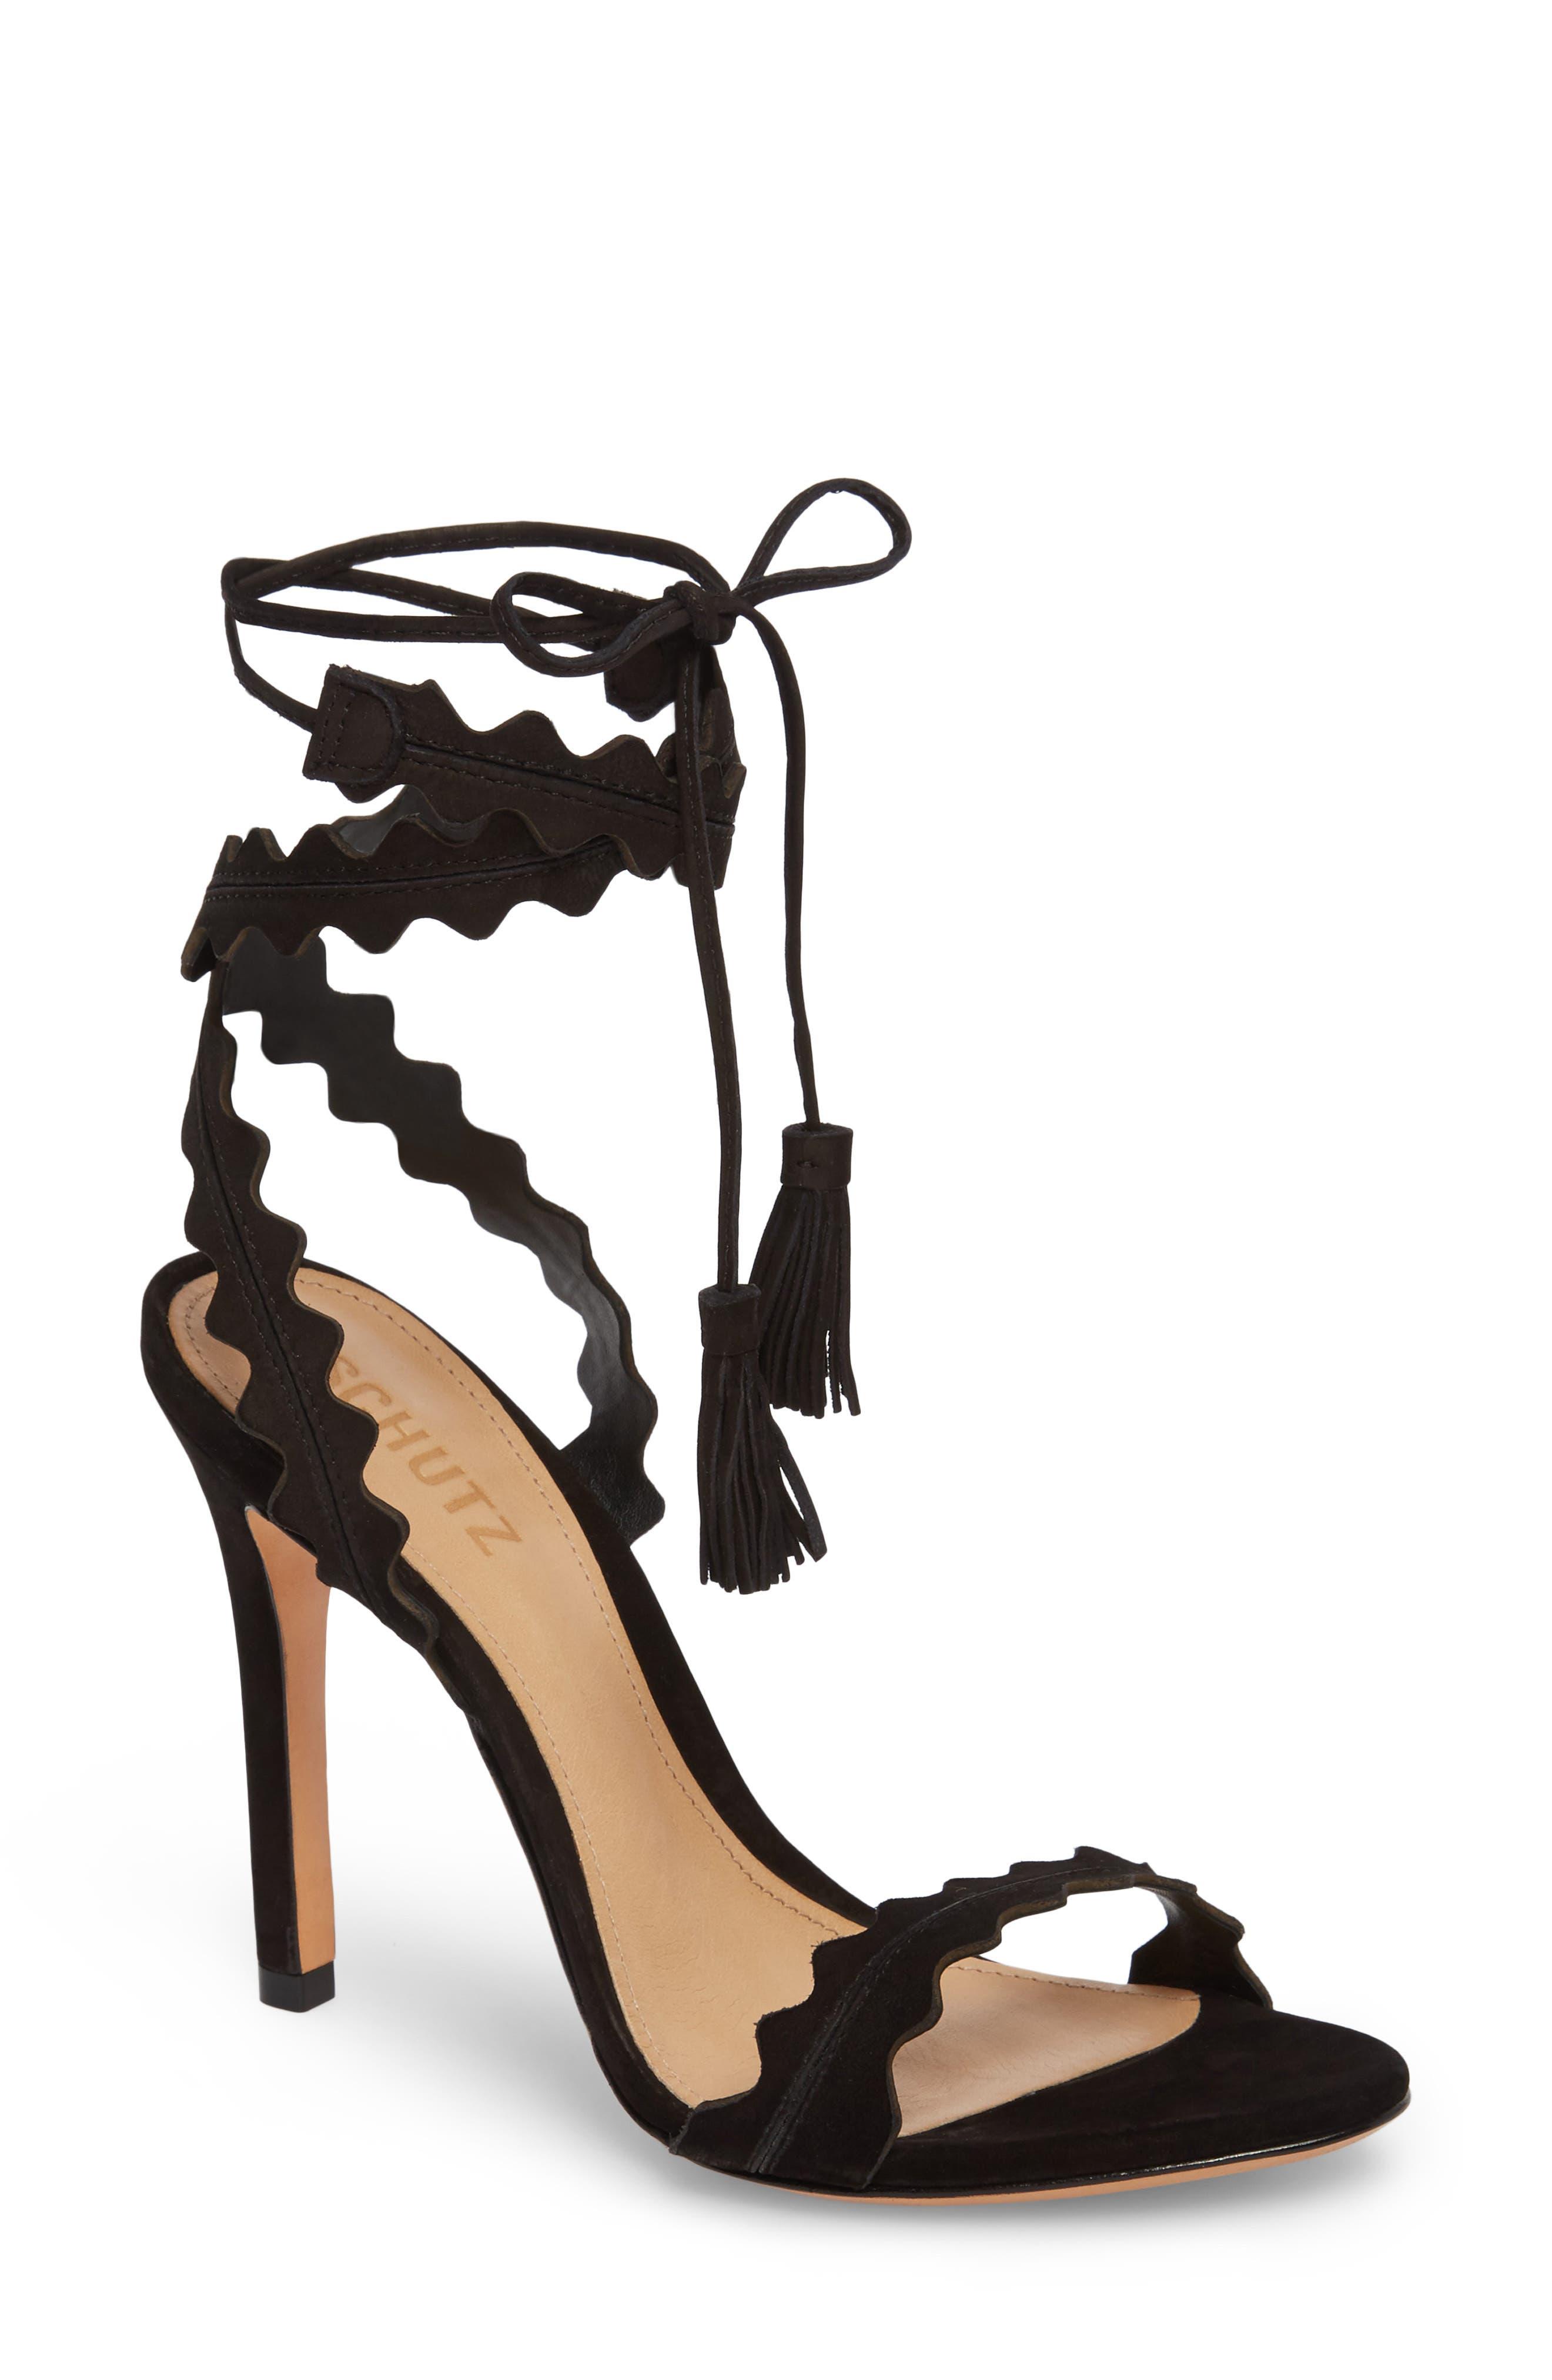 Lisana Wraparound Sandal,                             Main thumbnail 1, color,                             014